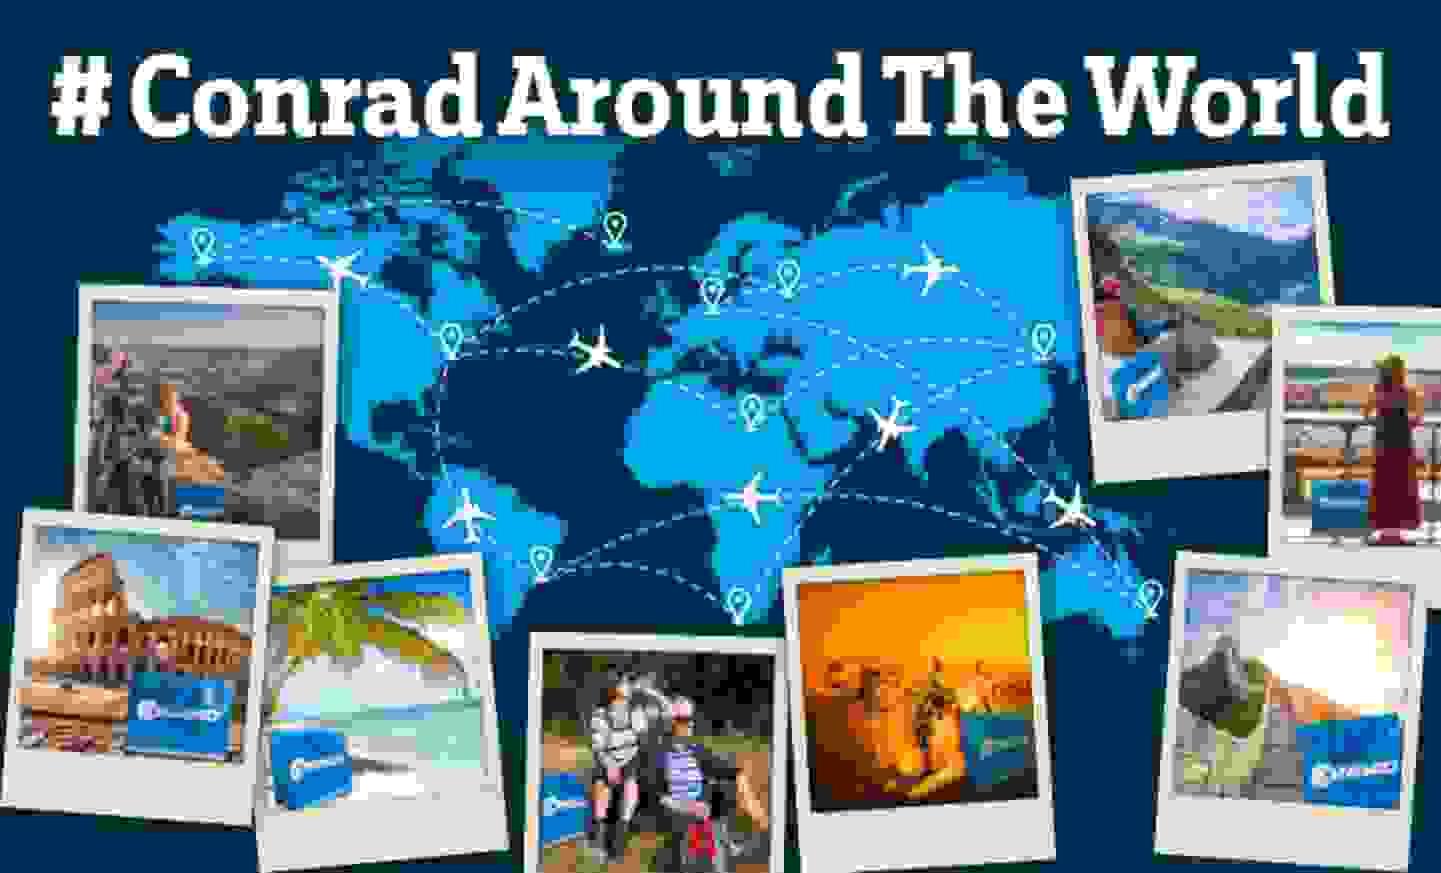 Conrad around the World